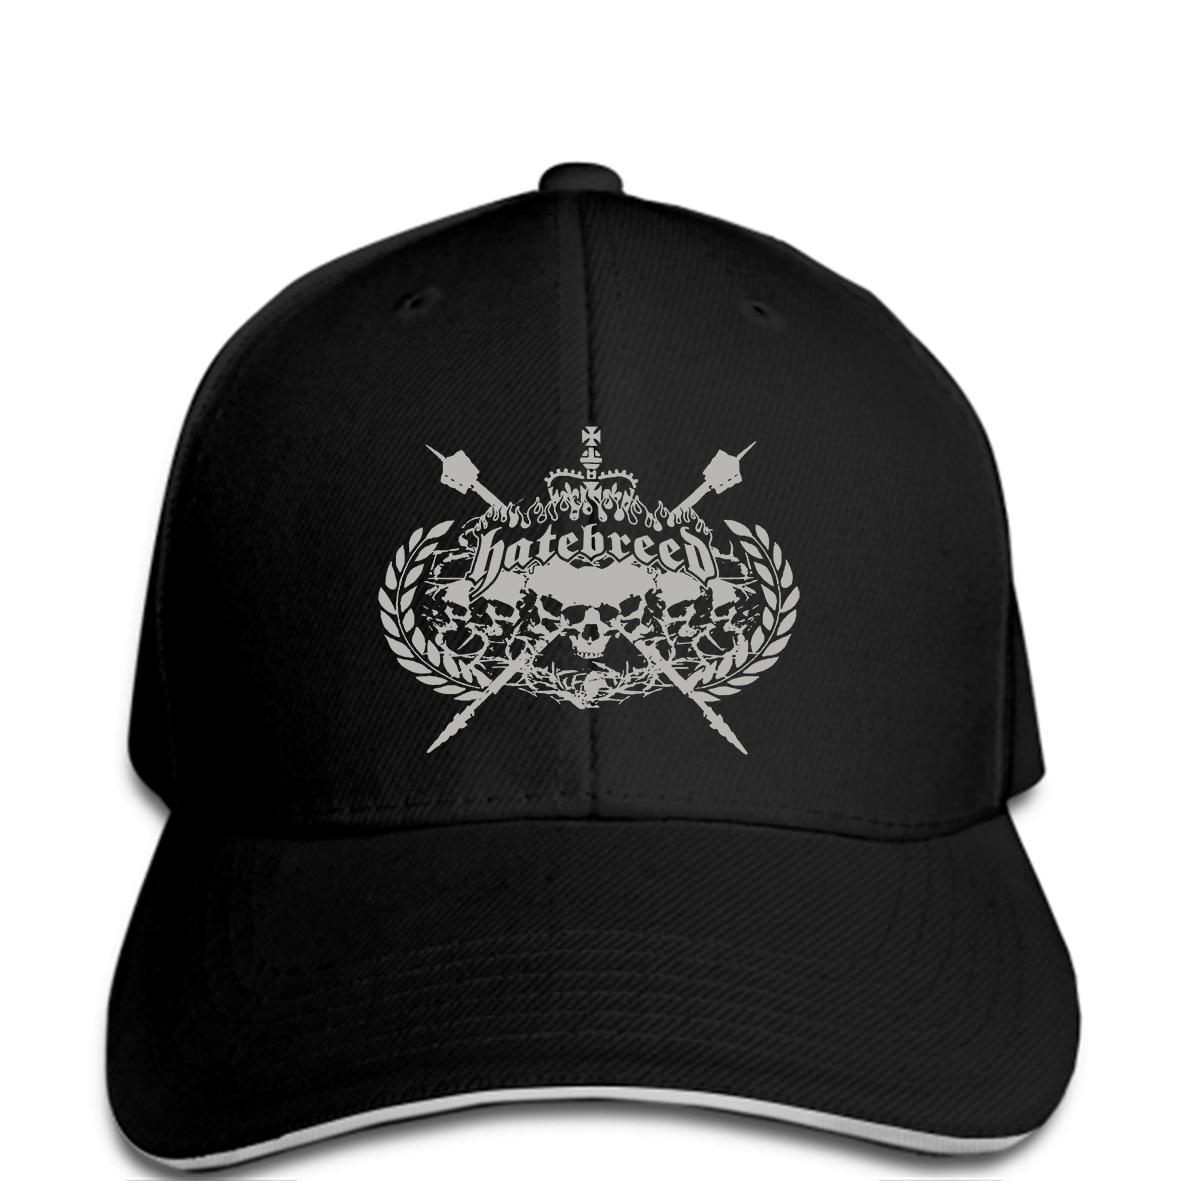 Hatebreed Skull Crest Hat NEW Licensed Band Merch Novelty Cool Men Baseball cap